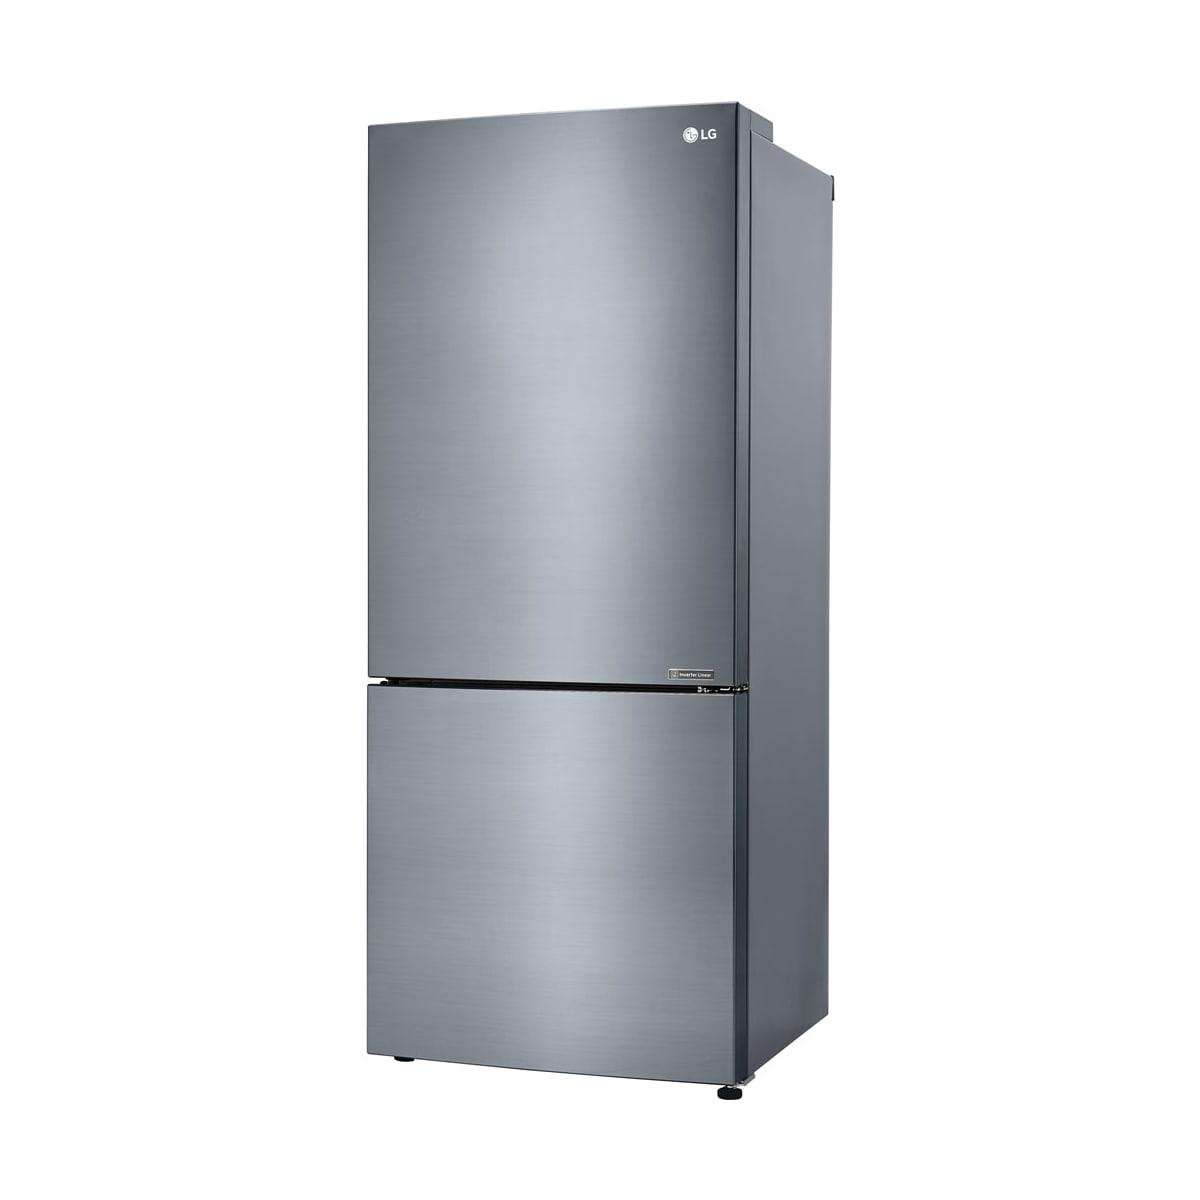 LG Bottom Mount Refrigerators - LBNC15221